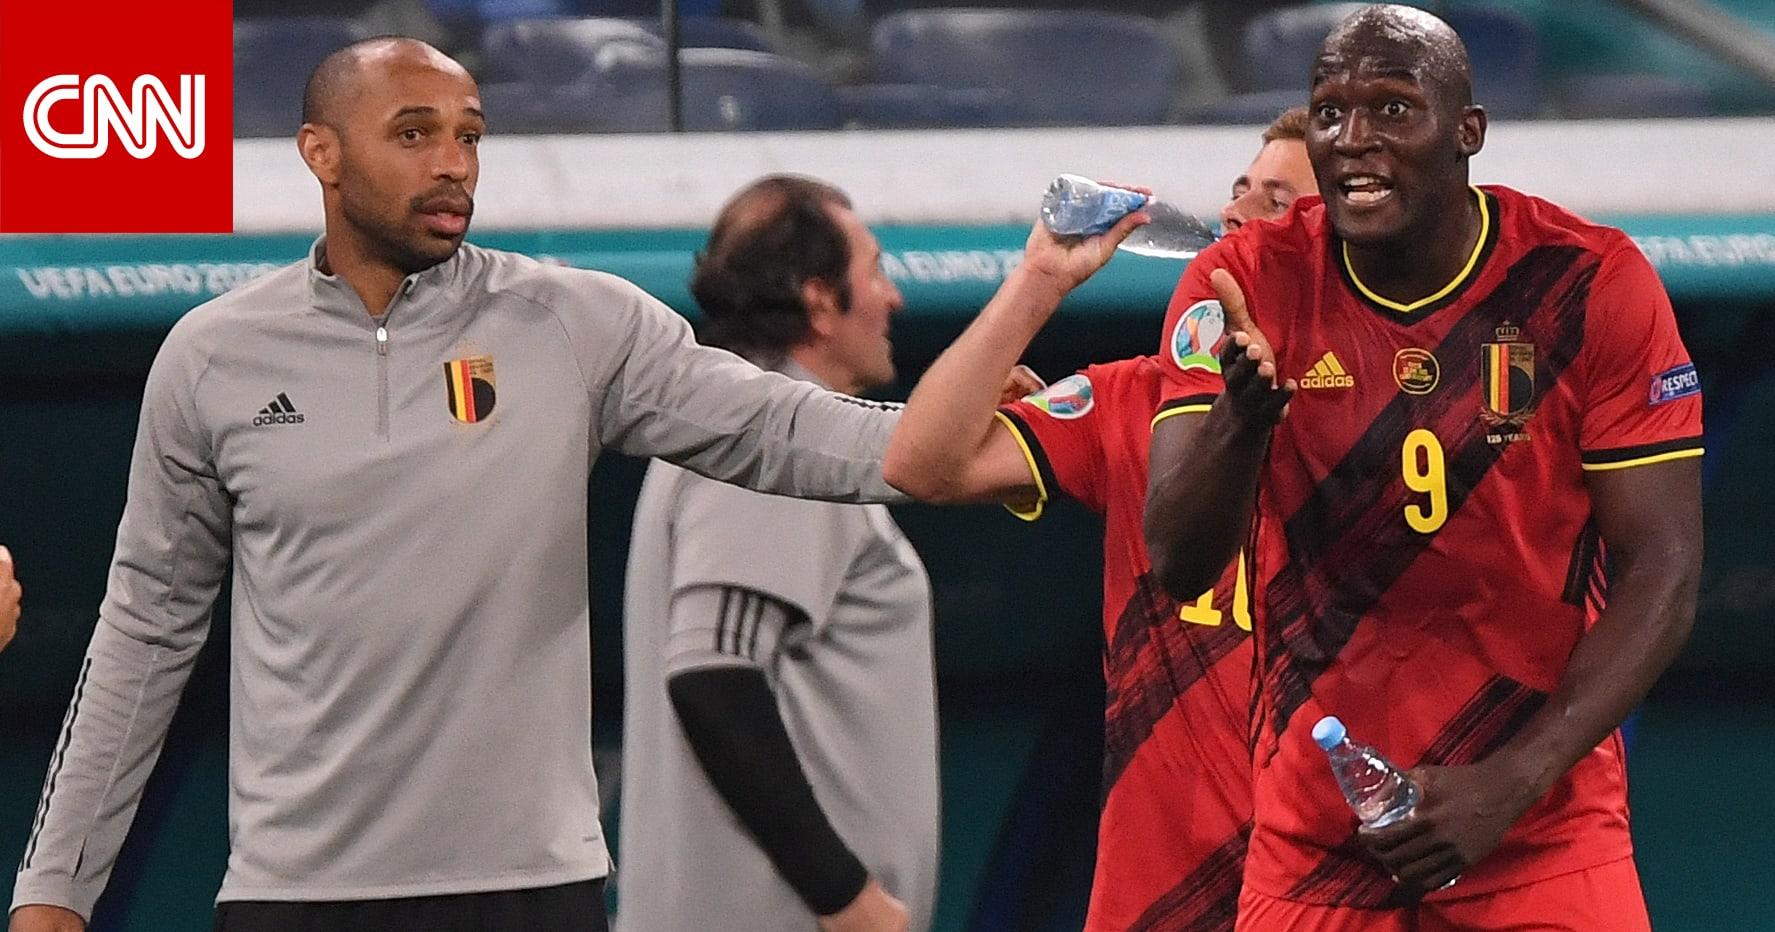 هنري يثير دهشة لاعبي بلجيكا.. فكيف كان رد فعل لوكاكو ودي بروين؟